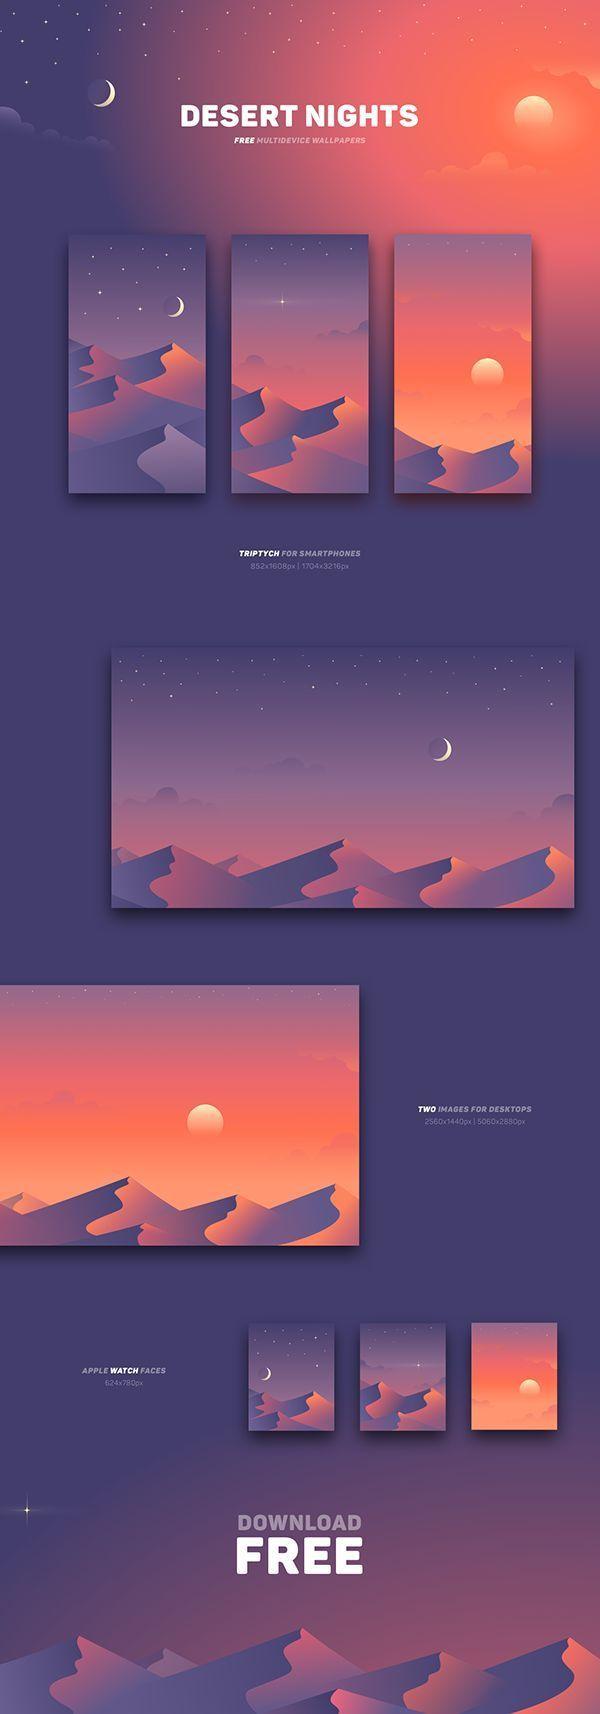 Desert Nights Free Wallpapers Desert Free Nights Wallpapers In 2020 Creative Web Design Graphic Design Graphic Design Inspiration